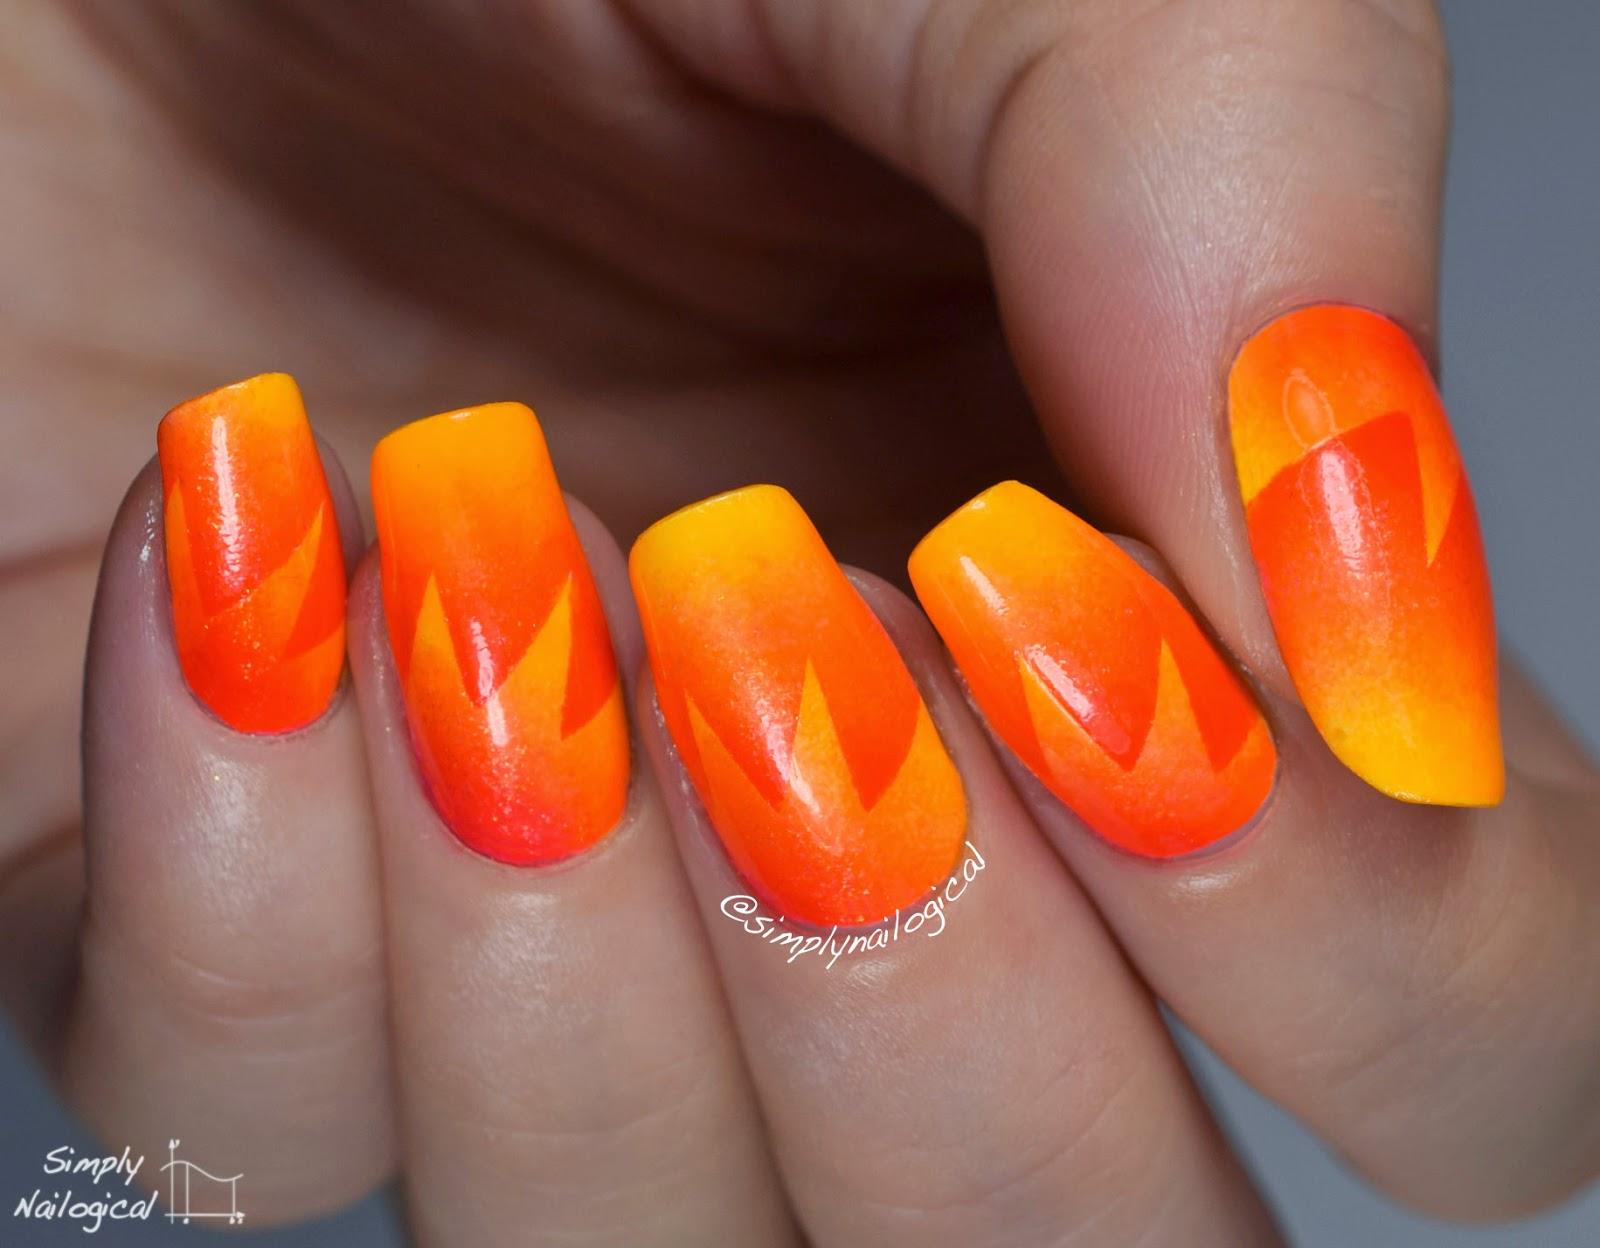 Simply Nailogical: Neon orange starburst scaled gradient